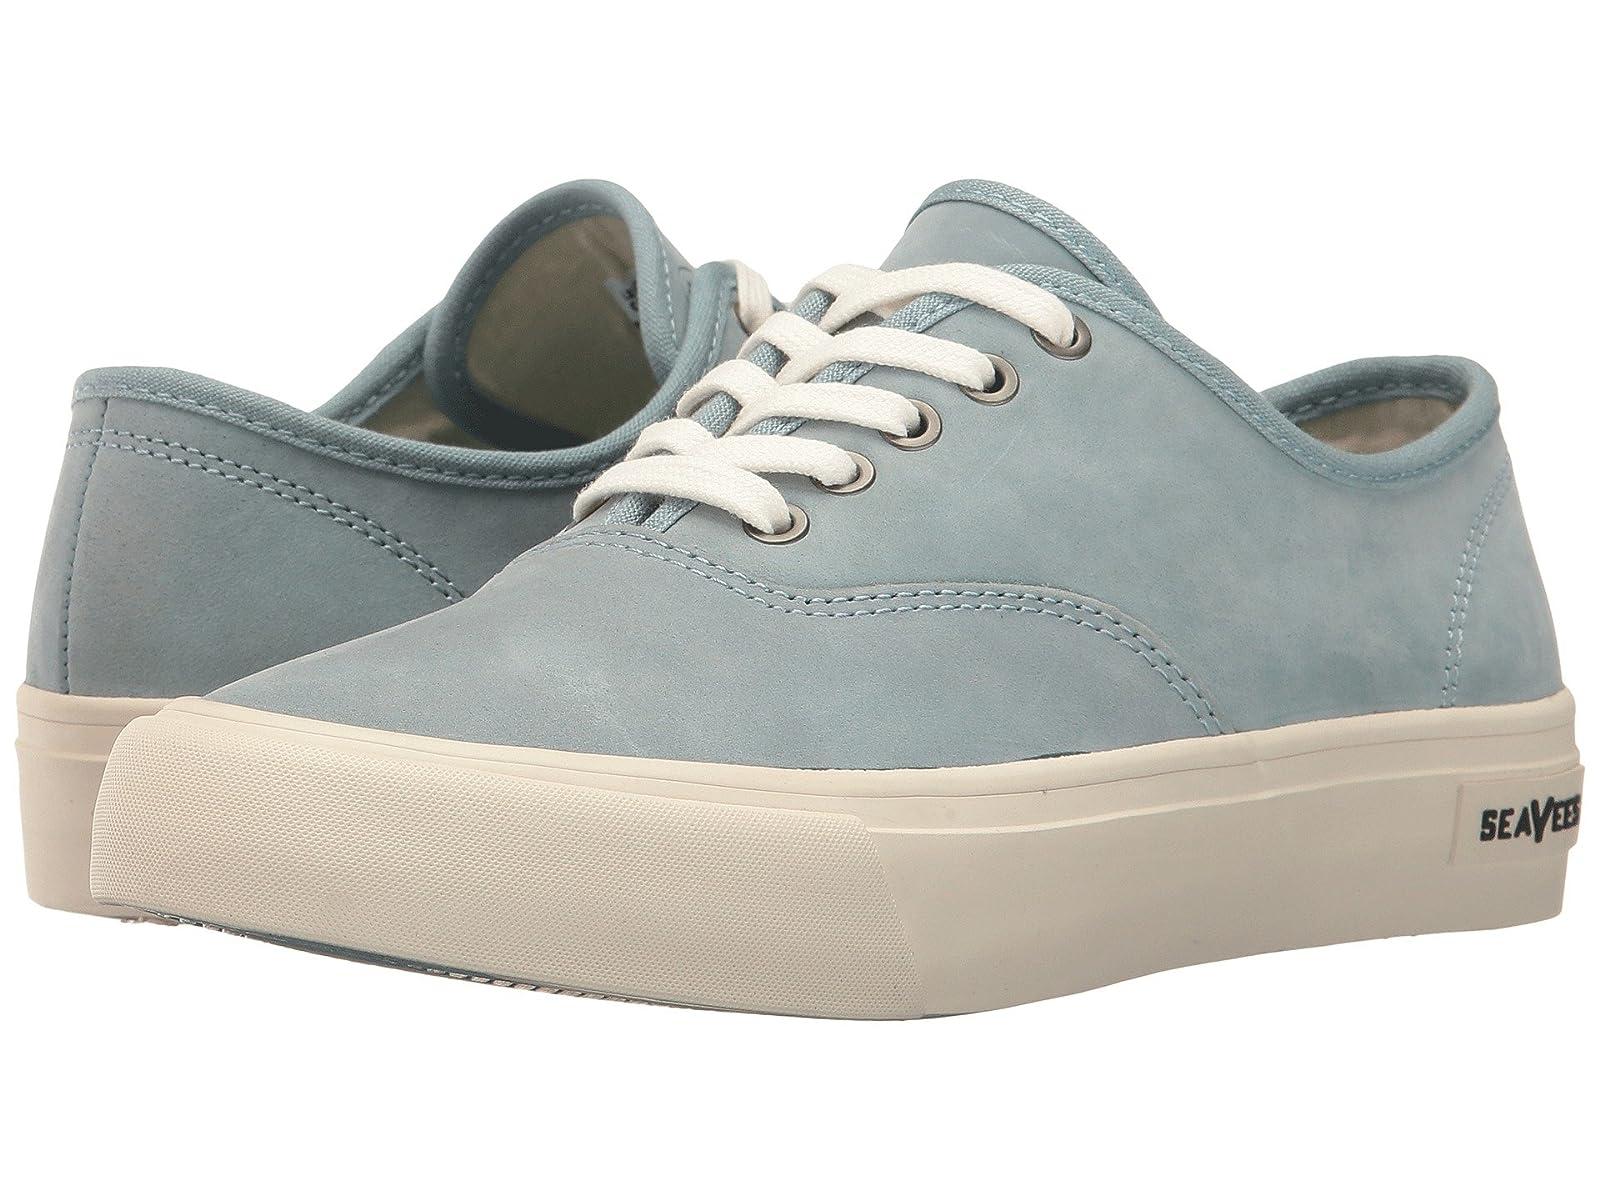 SeaVees 06/64 Legend Sneaker Clipper ClassCheap and distinctive eye-catching shoes